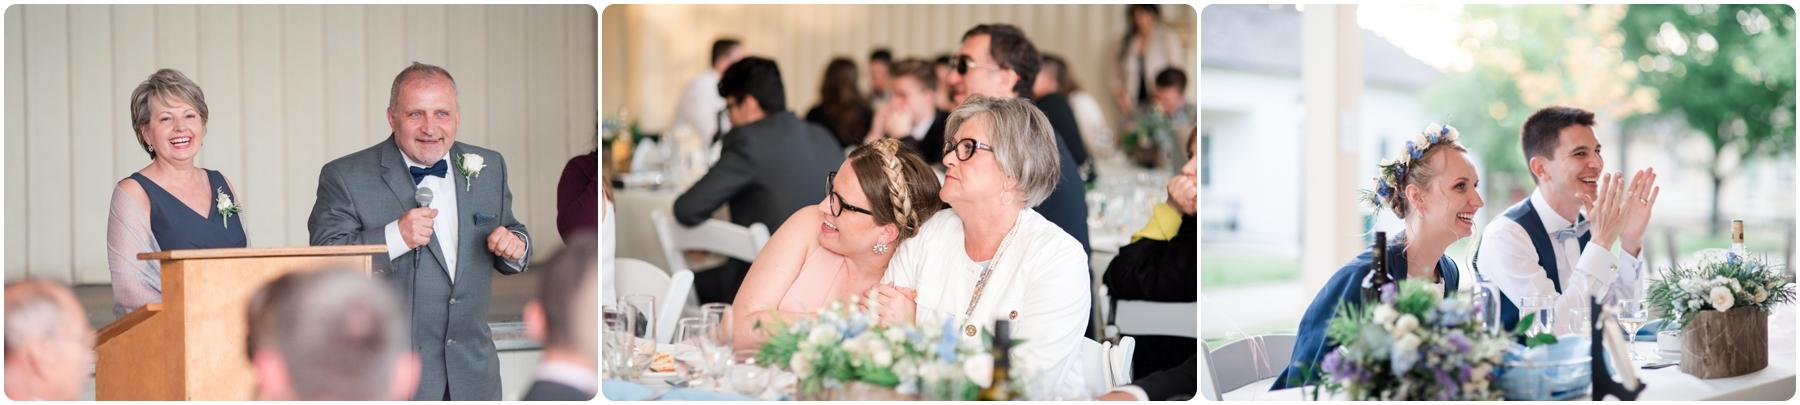 Black Creek Pioneer Village Wedding- Agata & Chris_0262